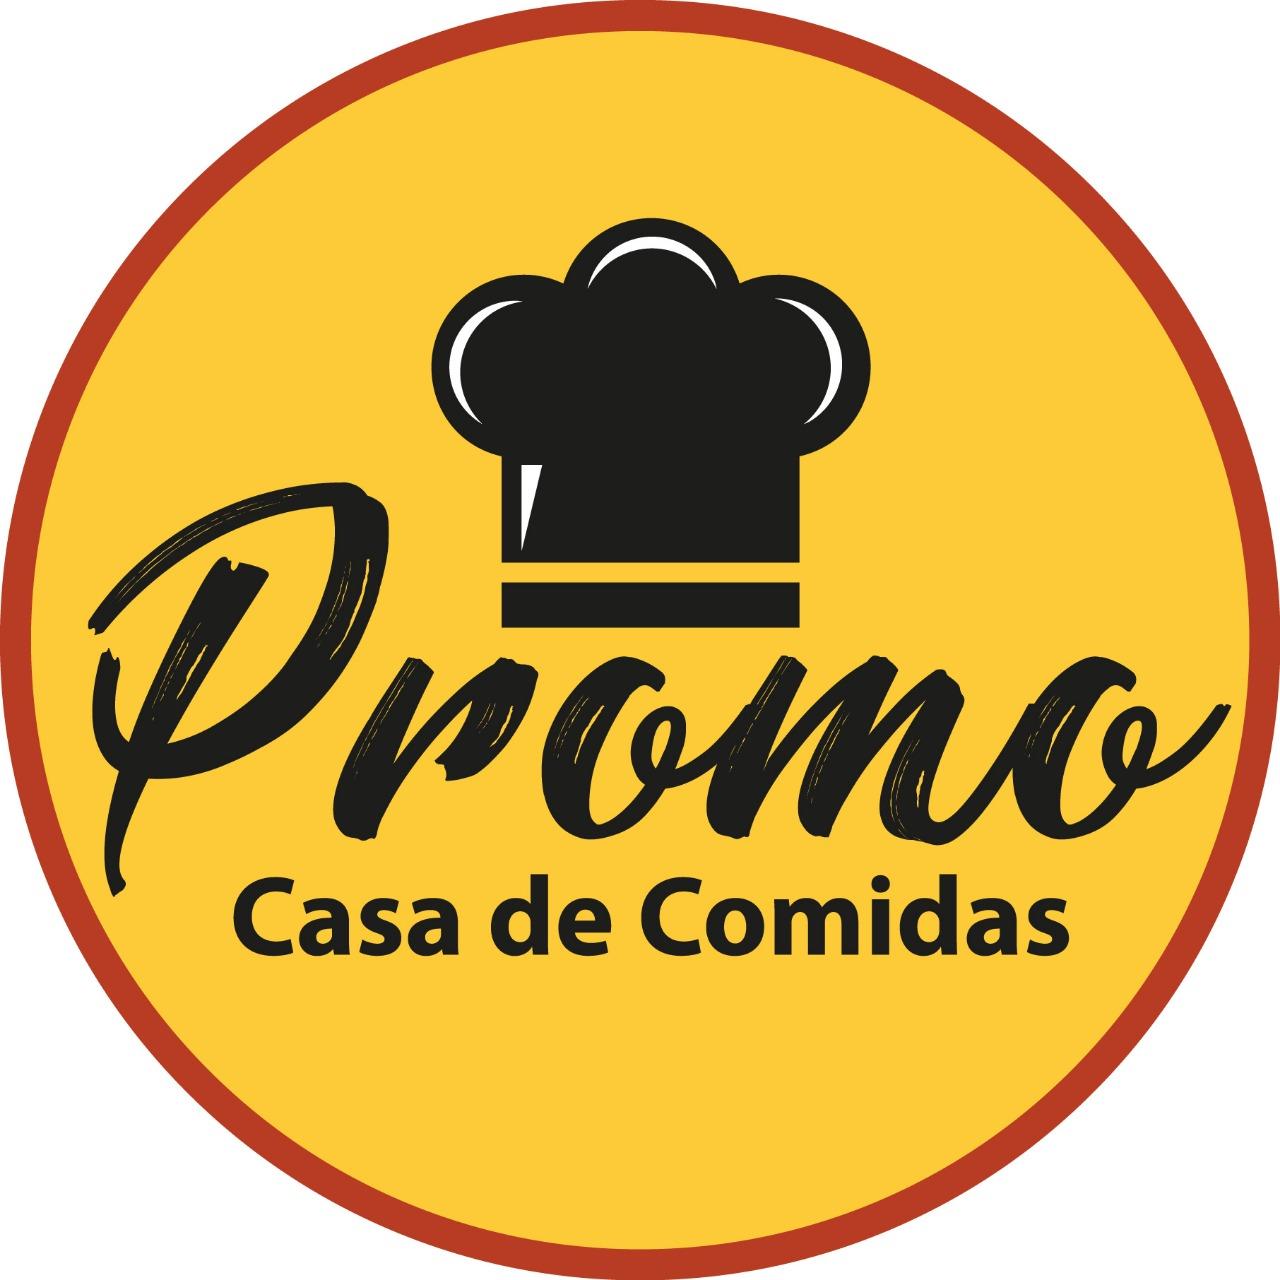 Promo Casa de Comidas - Pueyrredón